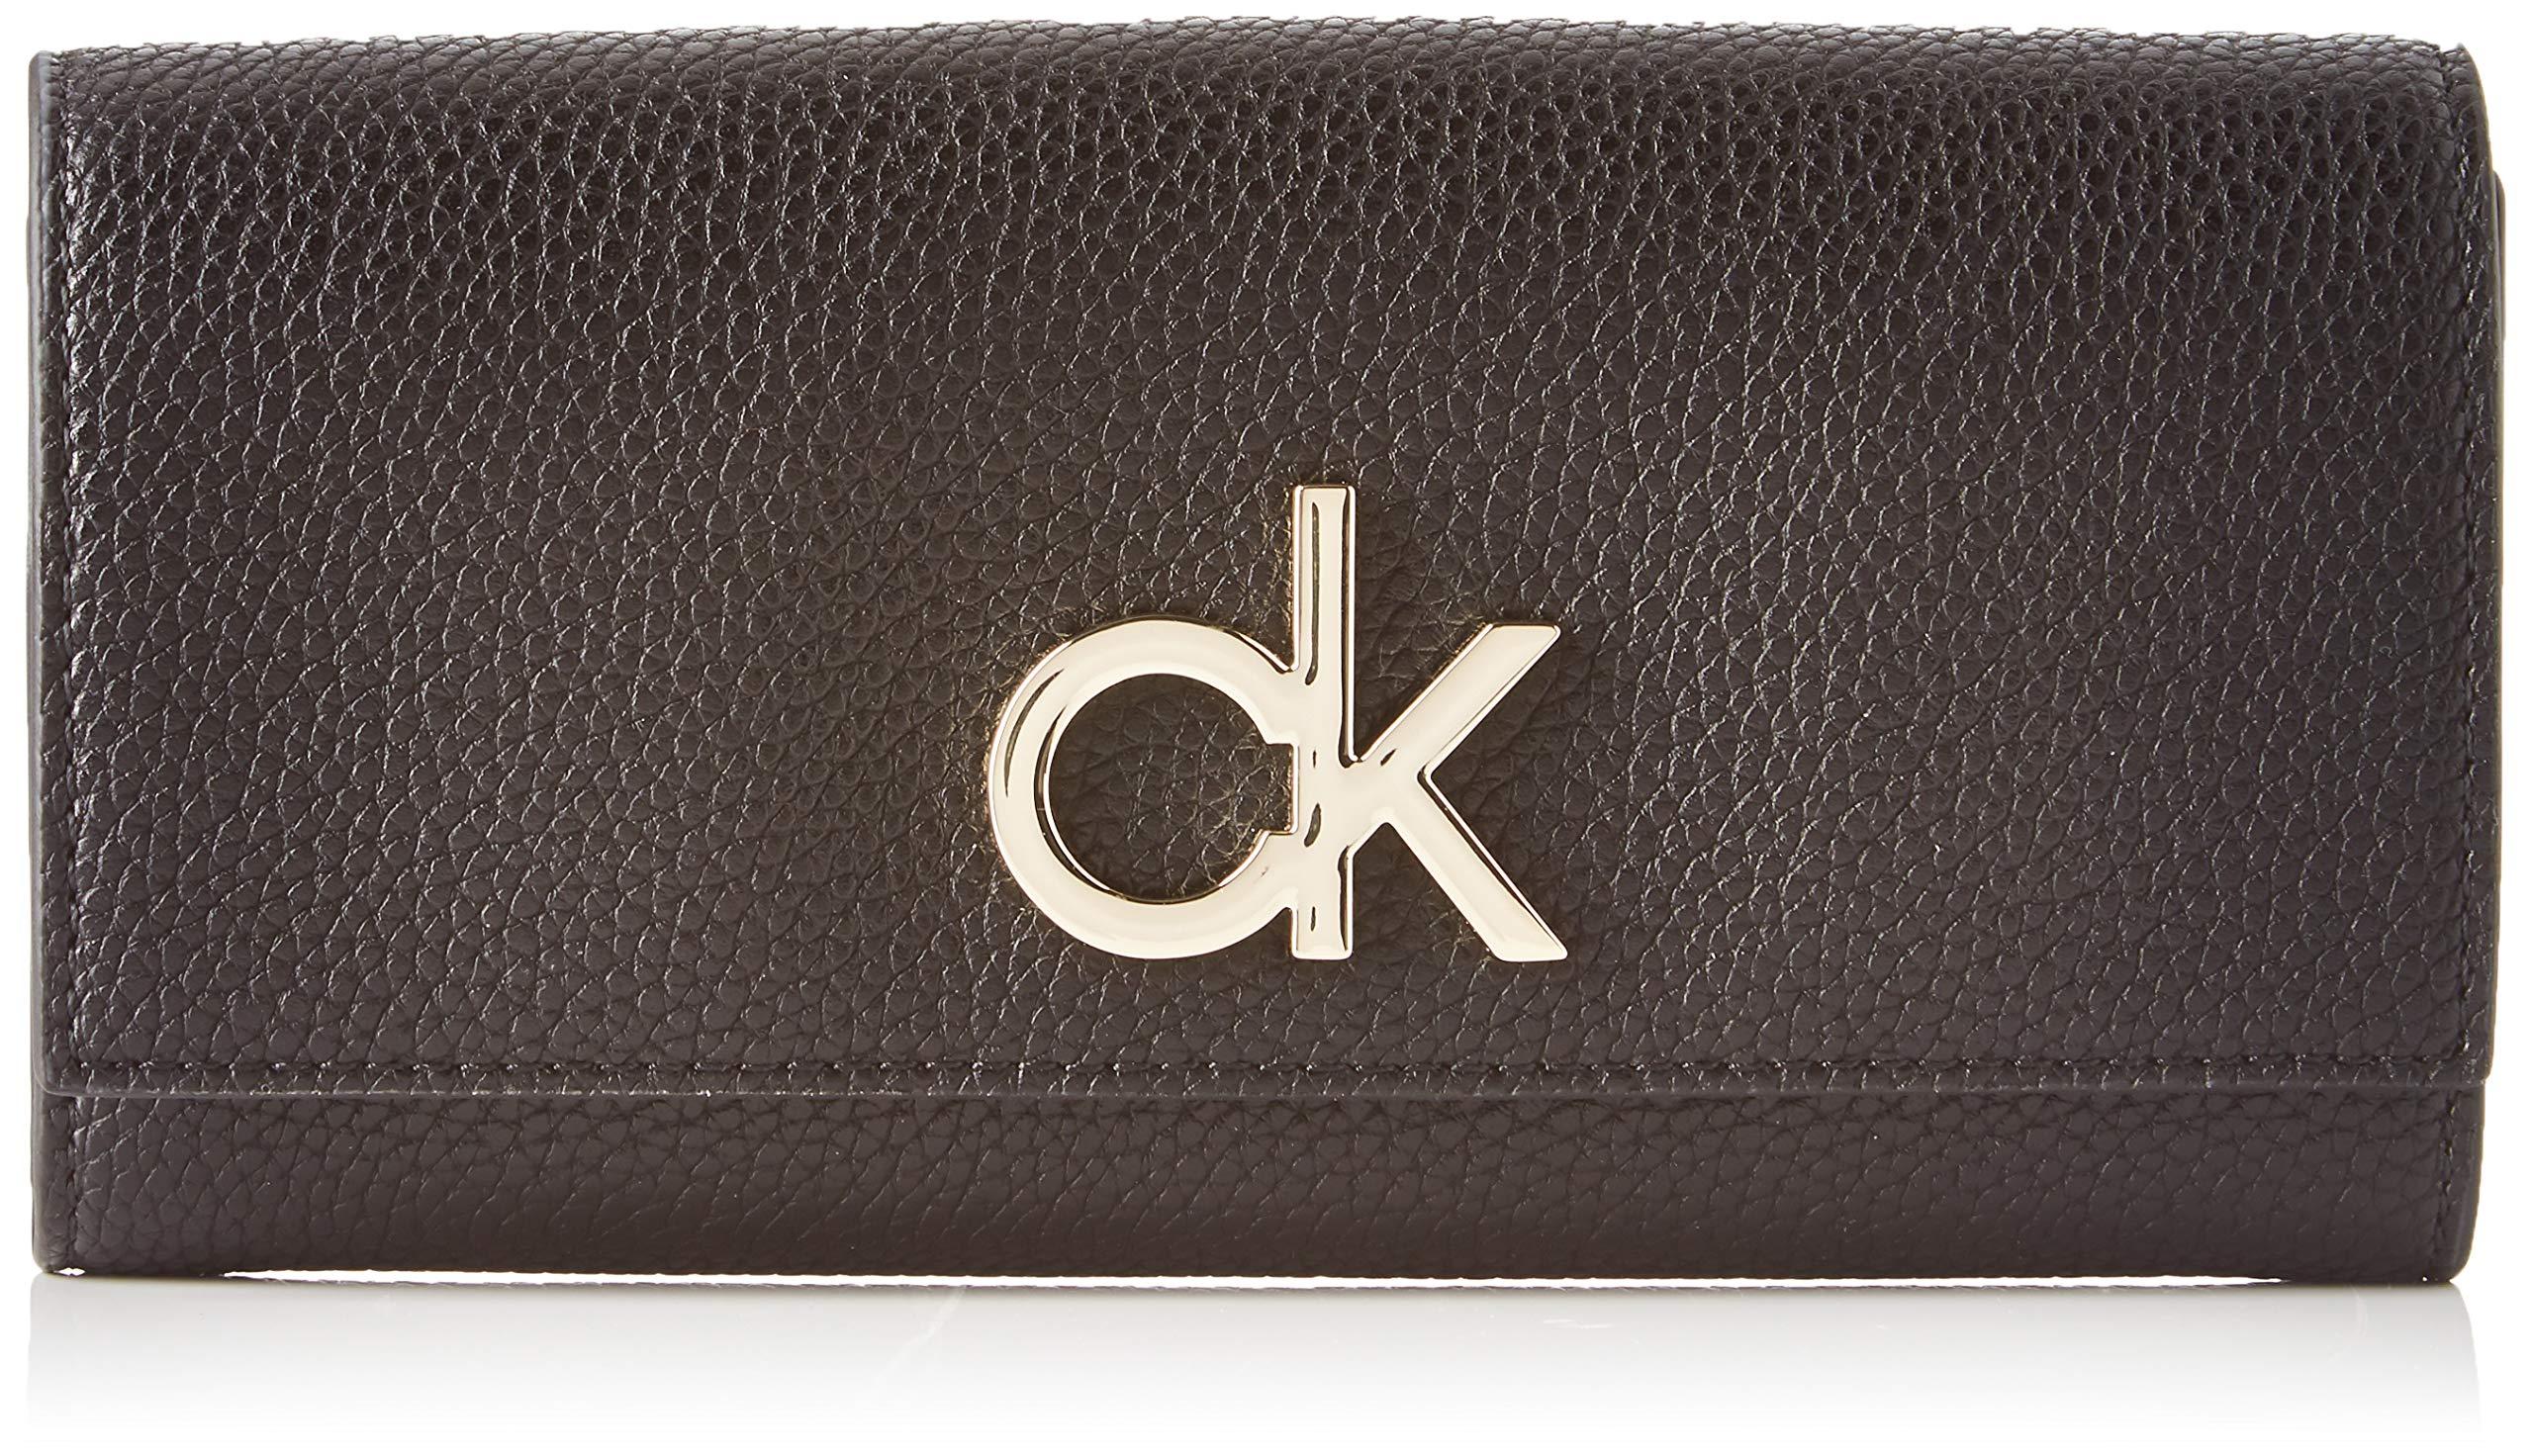 Re lock Cmw FemmeNoirblack1x1x1 Bandoulière Calvin Klein X H TrifoldSacs L Lrg AR4jL5